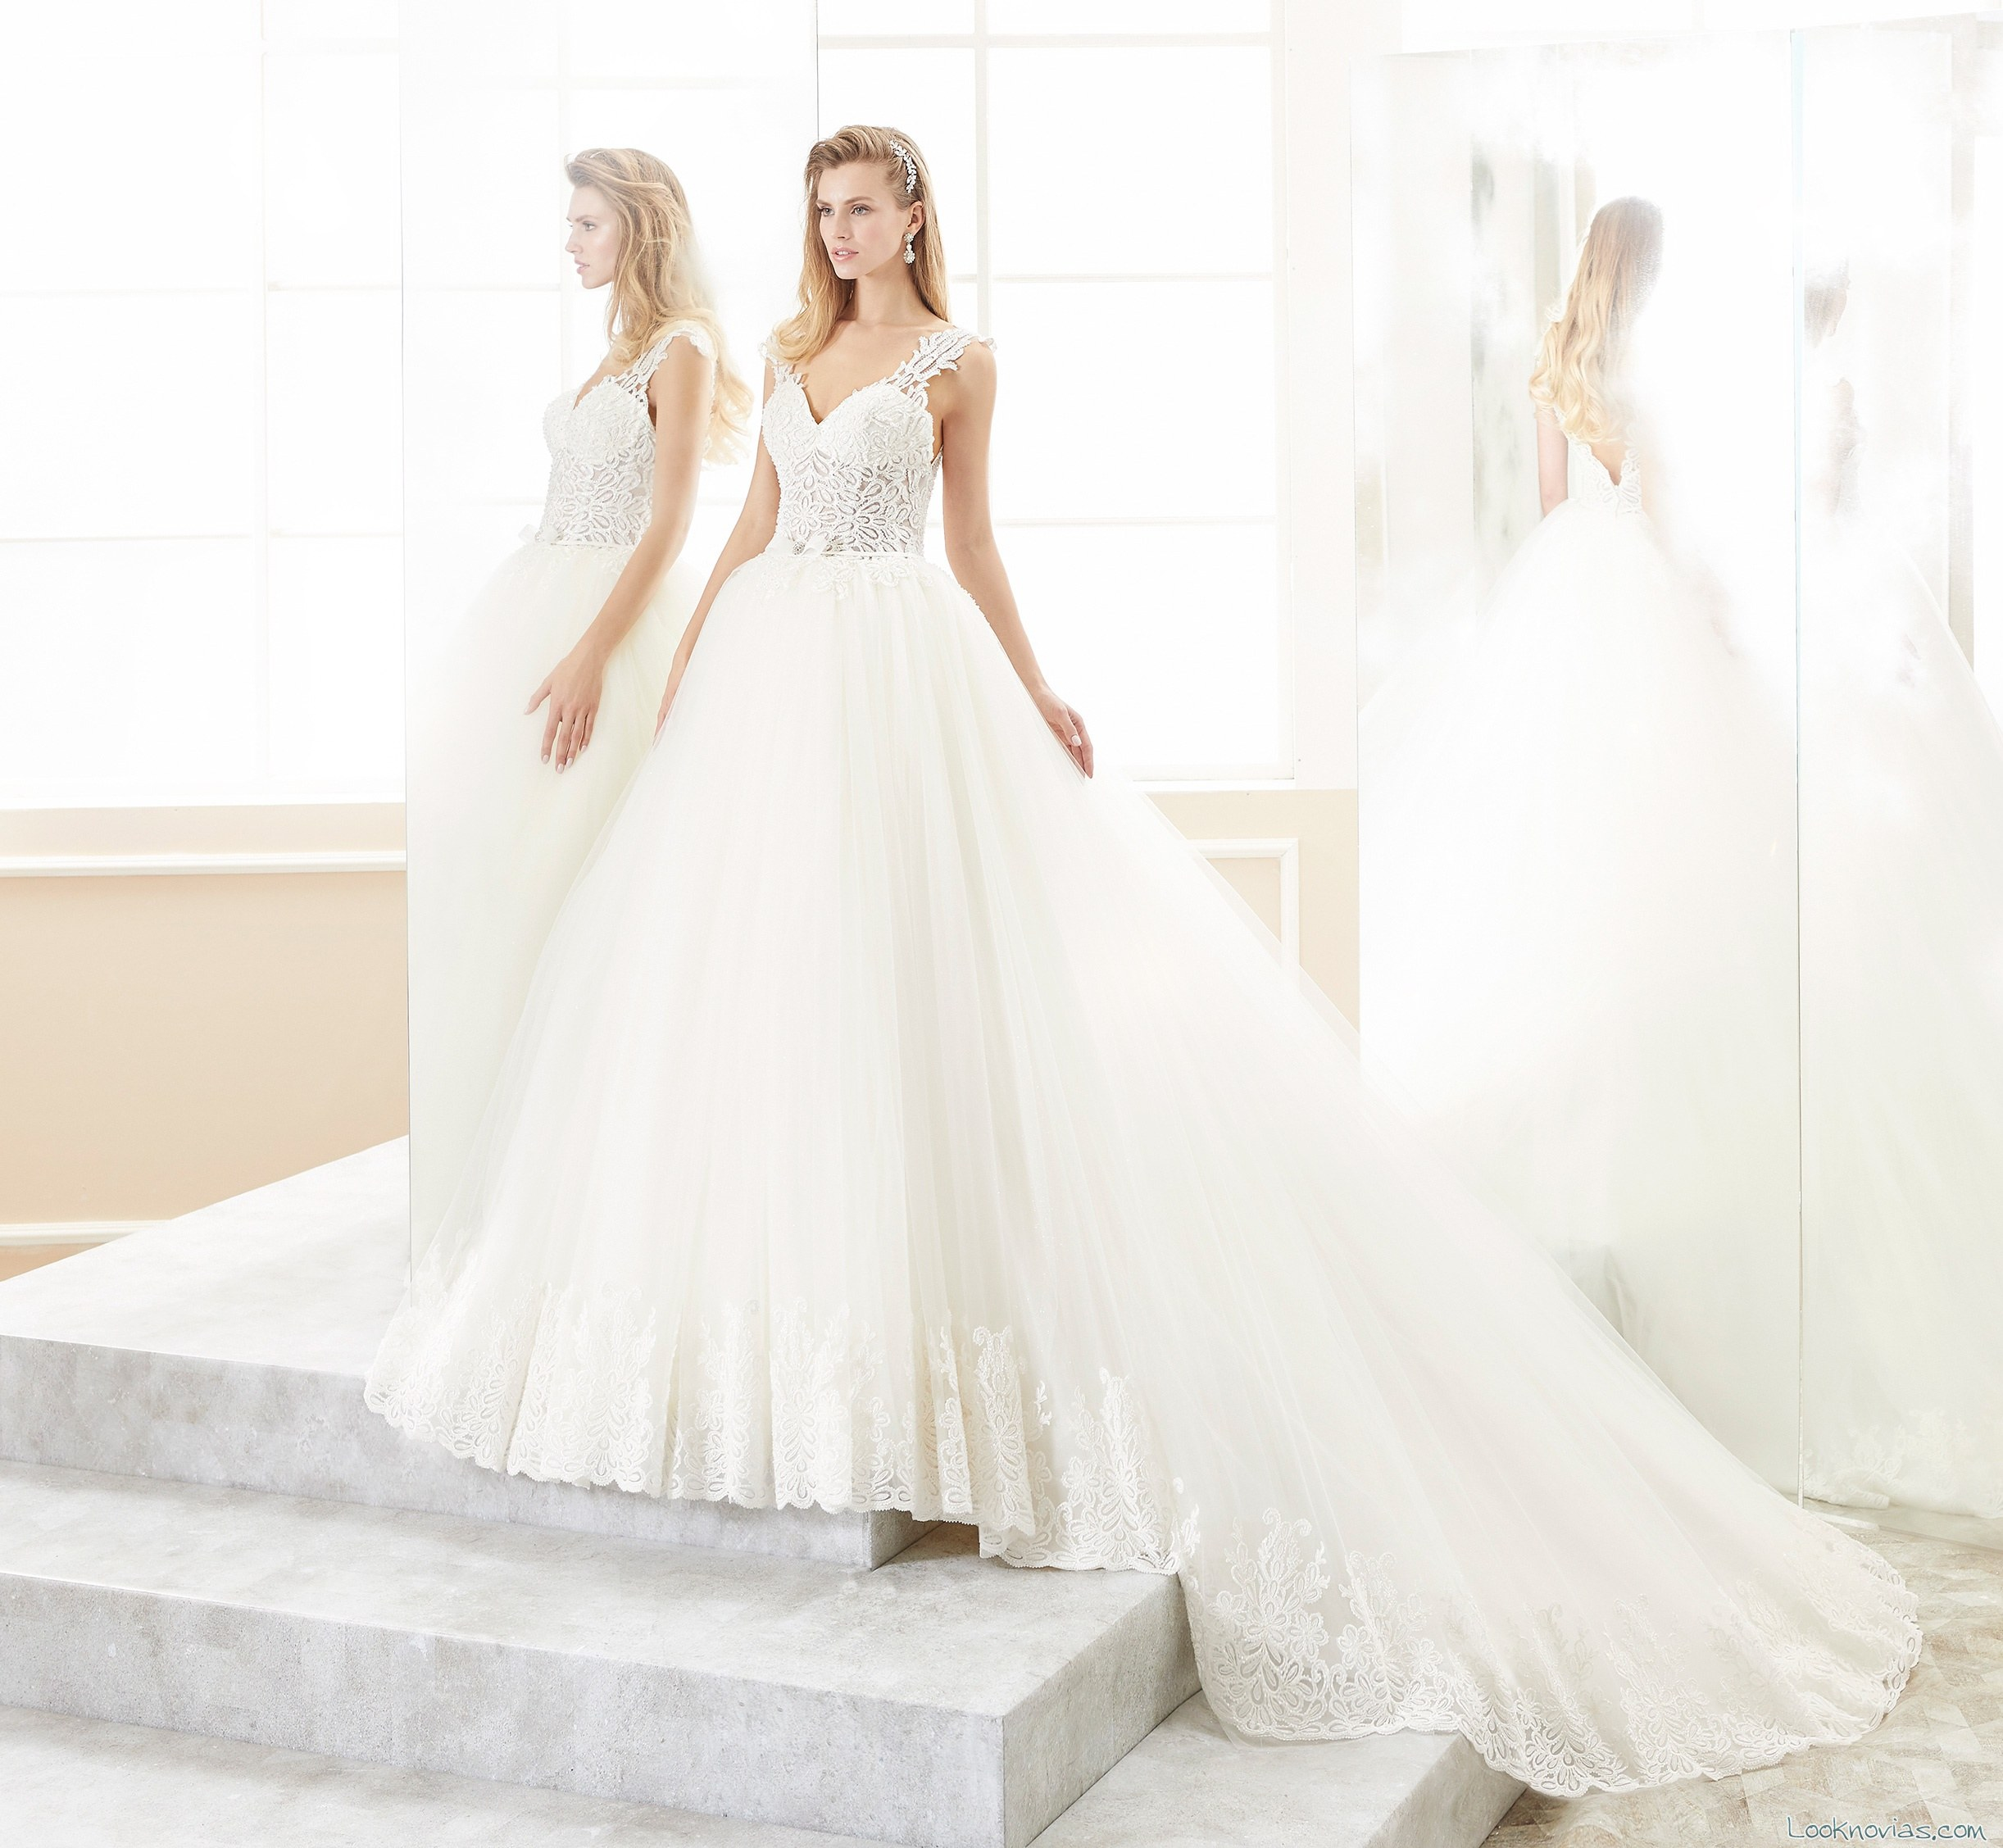 vestido nicole spose romance 2018